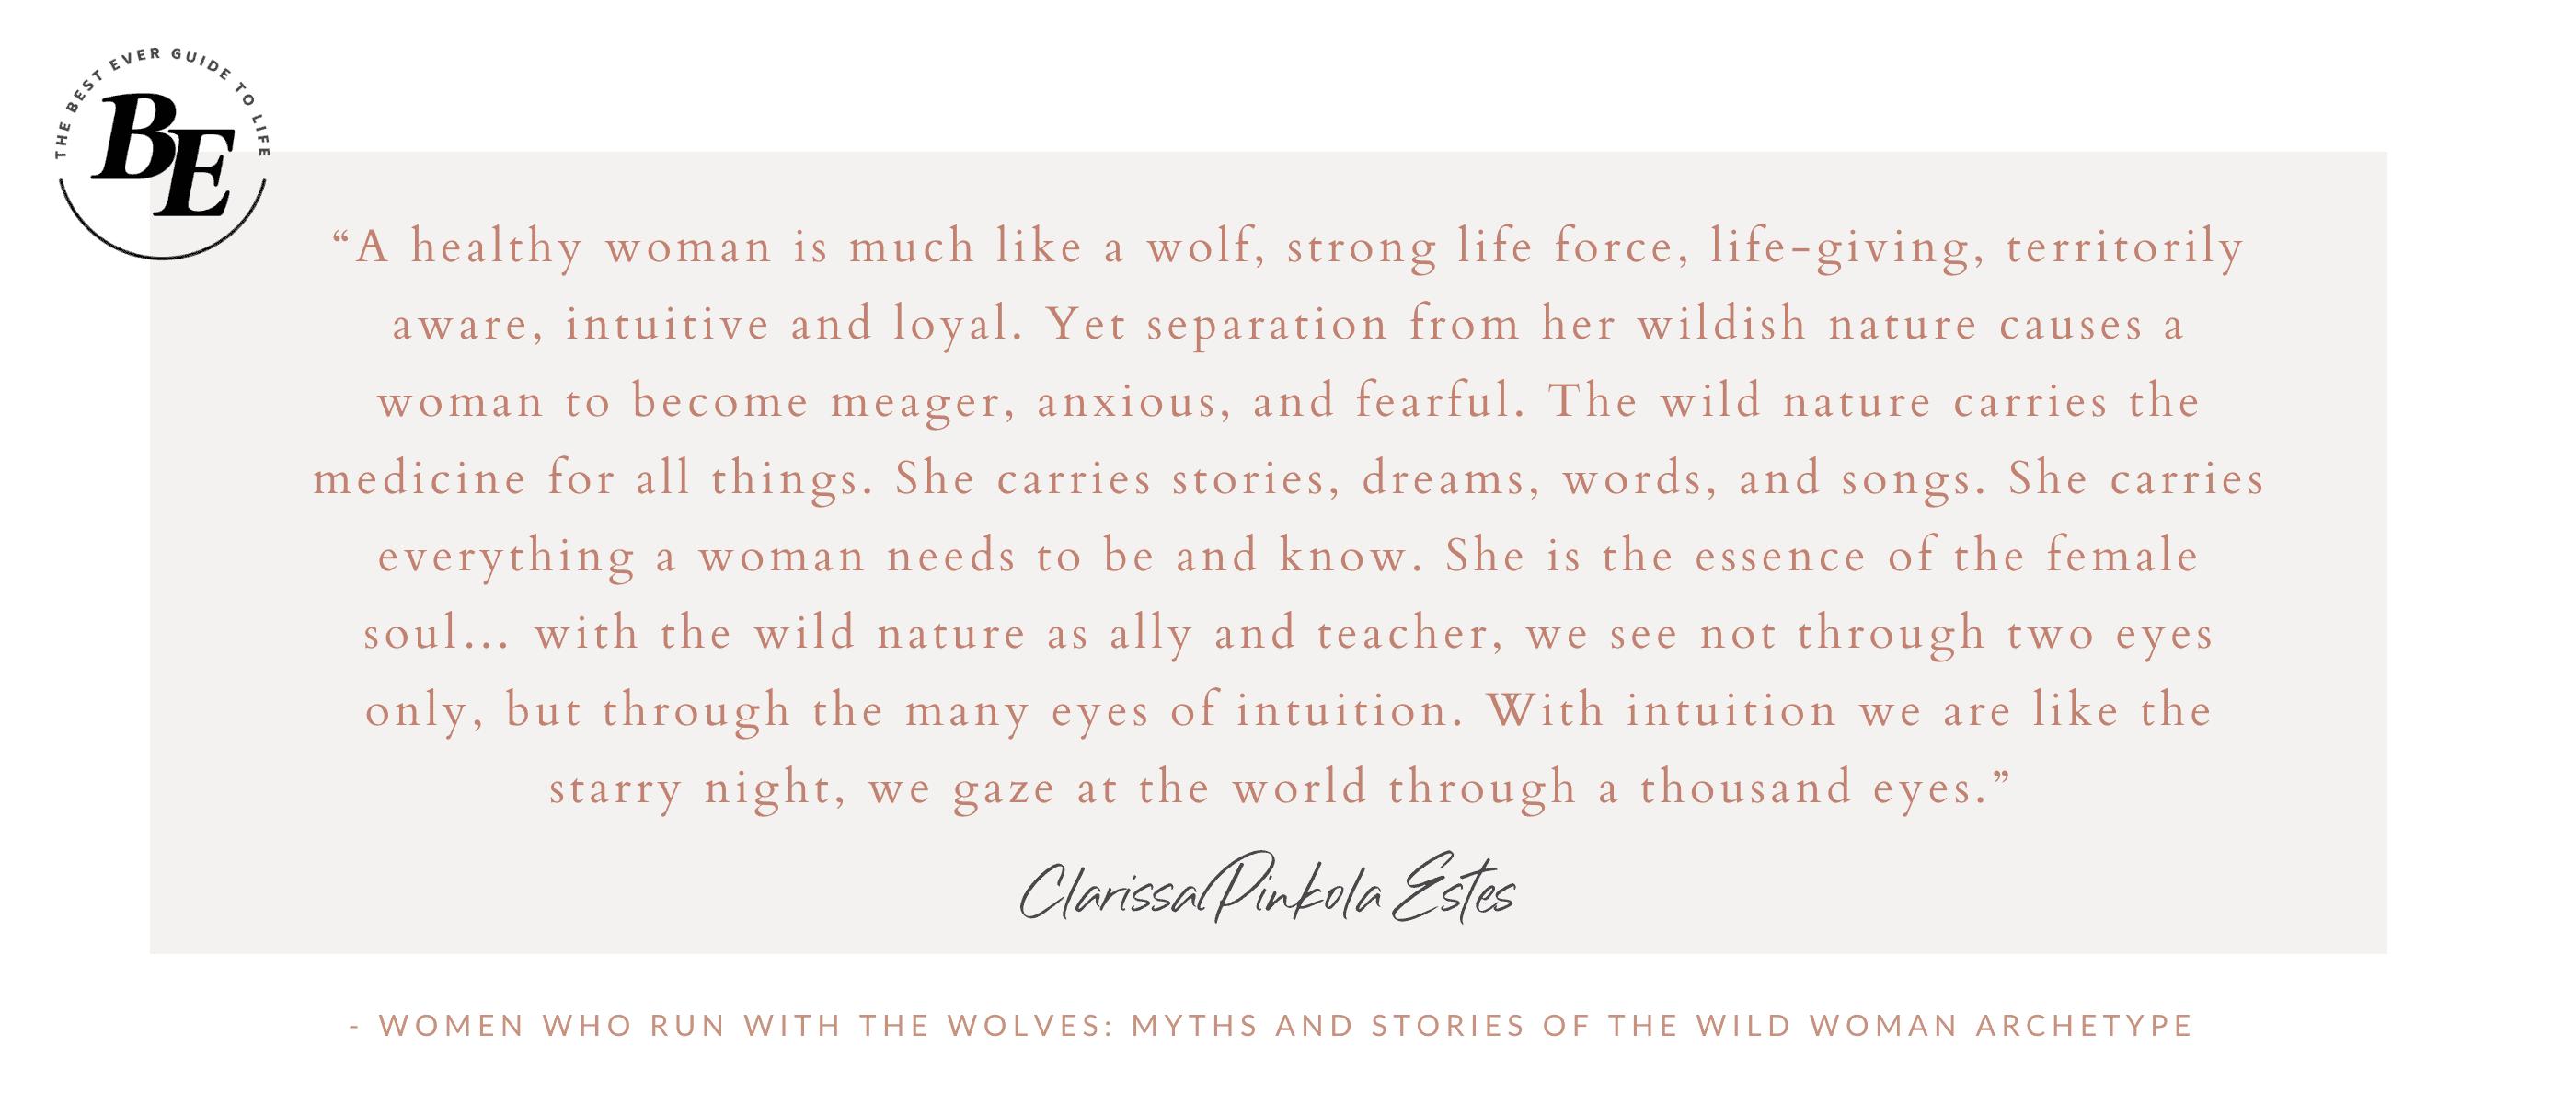 CPE Wise Wild Woman